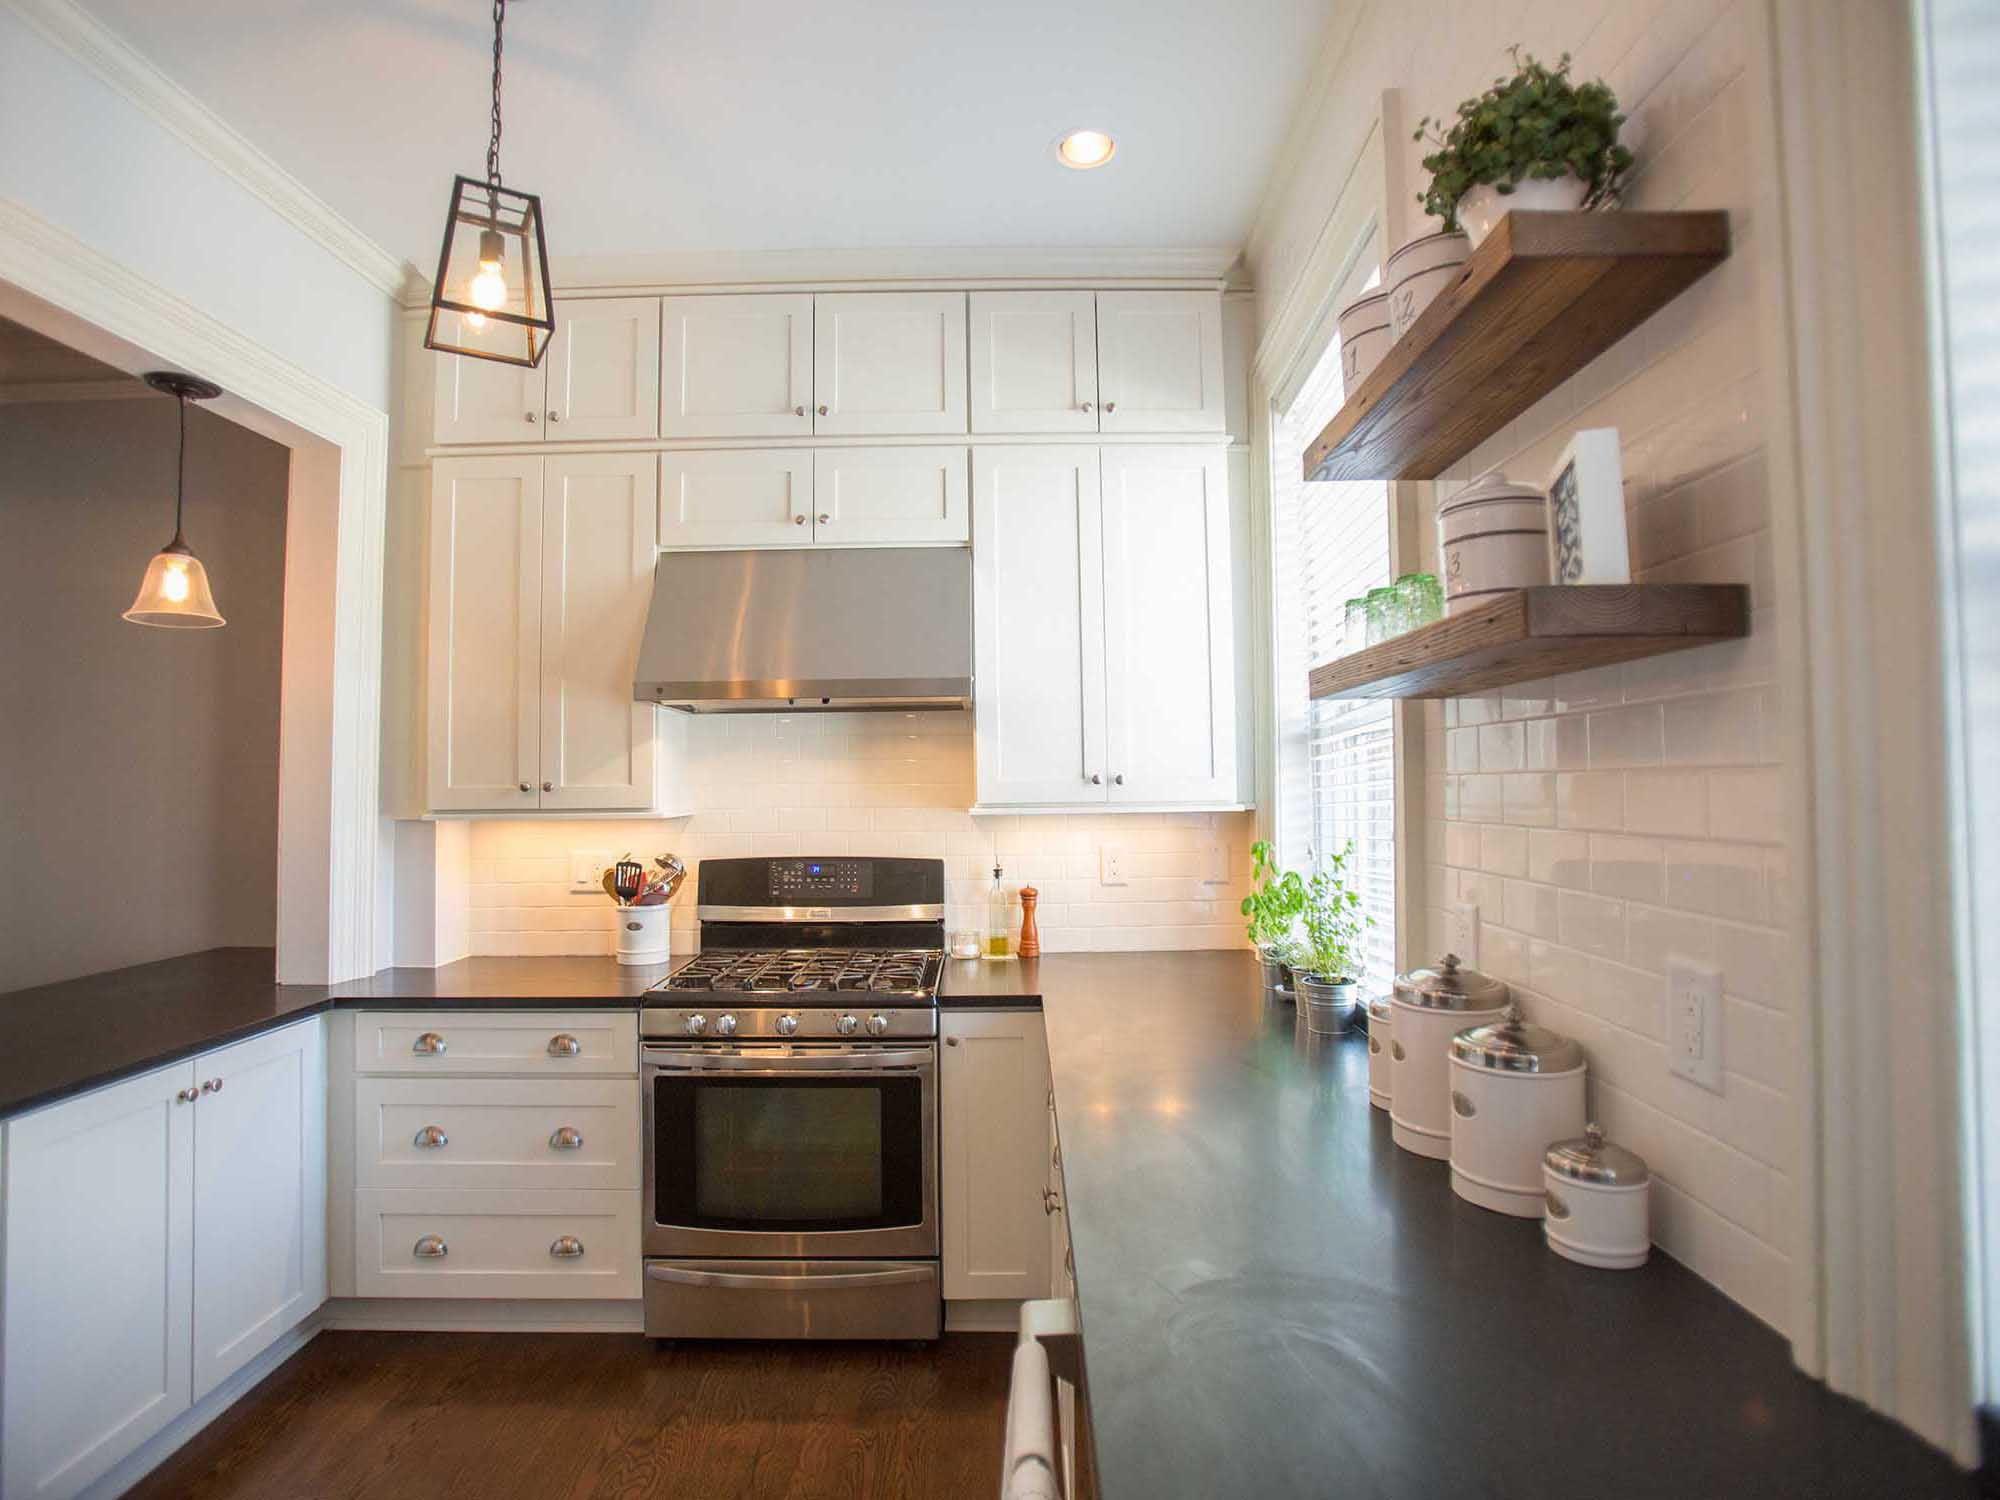 Kitchen Design Ideas Shaker Cabinets phoenix kitchen gallery features cliqstudios dayton painted